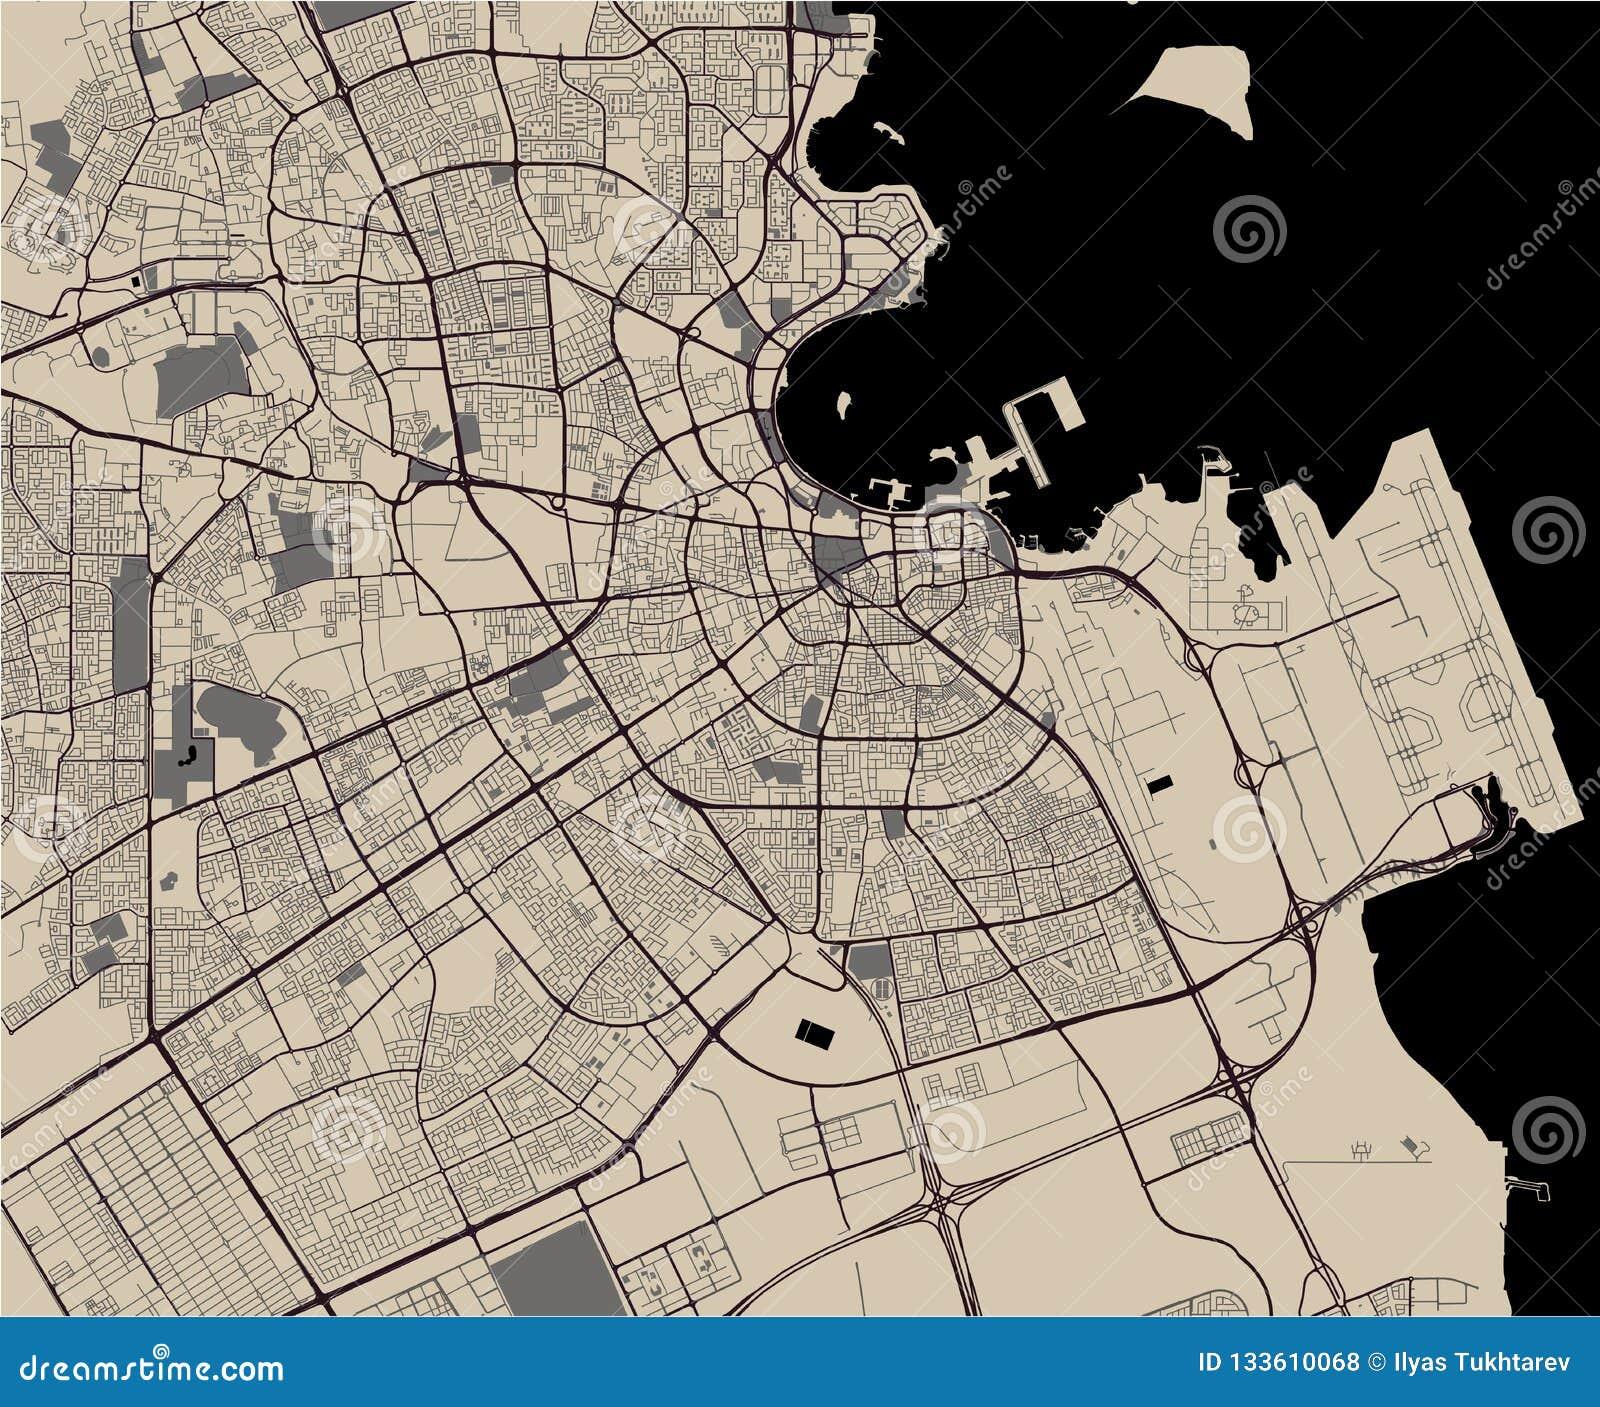 Map Of The City Of Doha, Qatar Stock Illustration ... Qatar Area Map on italy map area, algeria map area, cape verde map area, jamaica map area, bangladesh map area, kuwait map area, lebanon map area, puerto rico map area, palestine map area, egypt map area, rwanda map area, syria map area, middle east map area, iceland map area, haiti map area, japan map area, albania map area, asia map area, cayman islands map area, saudi arabia map area,